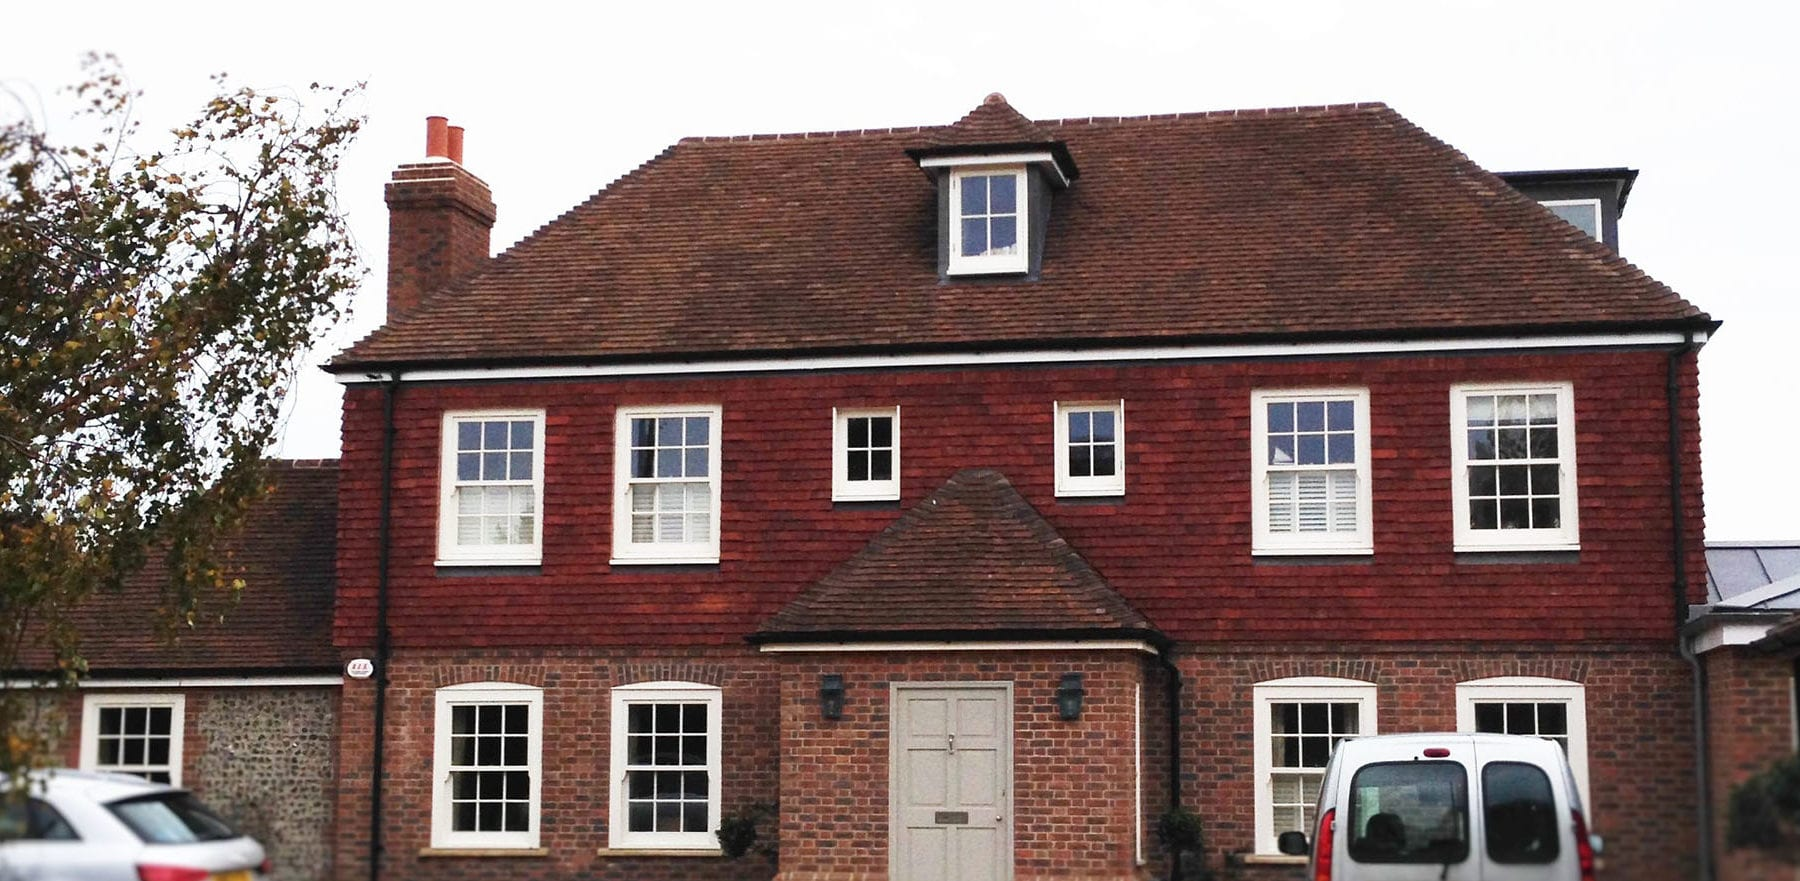 Lifestiles - Handmade Restoration Clay Roof Tiles - Chidham, England 2